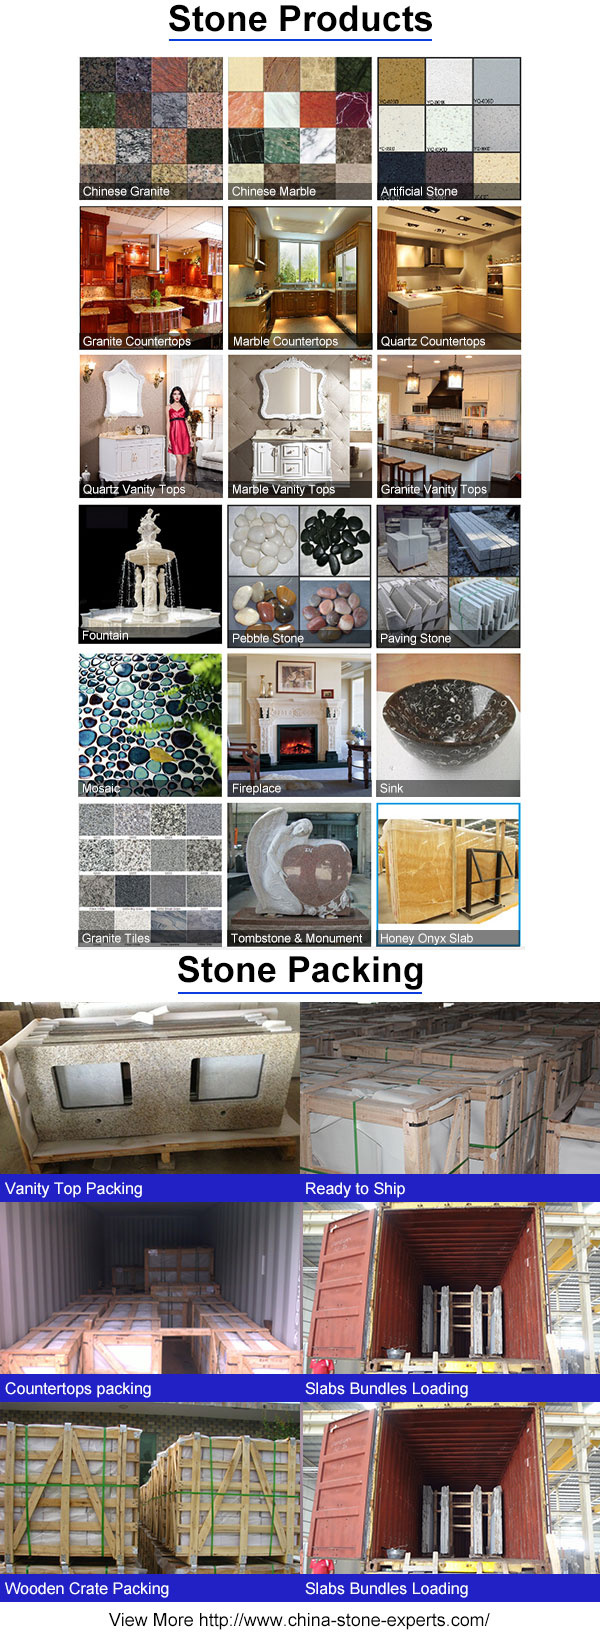 Roman Travertine Slab for Hotel Wall & Floor Tile or Countertops